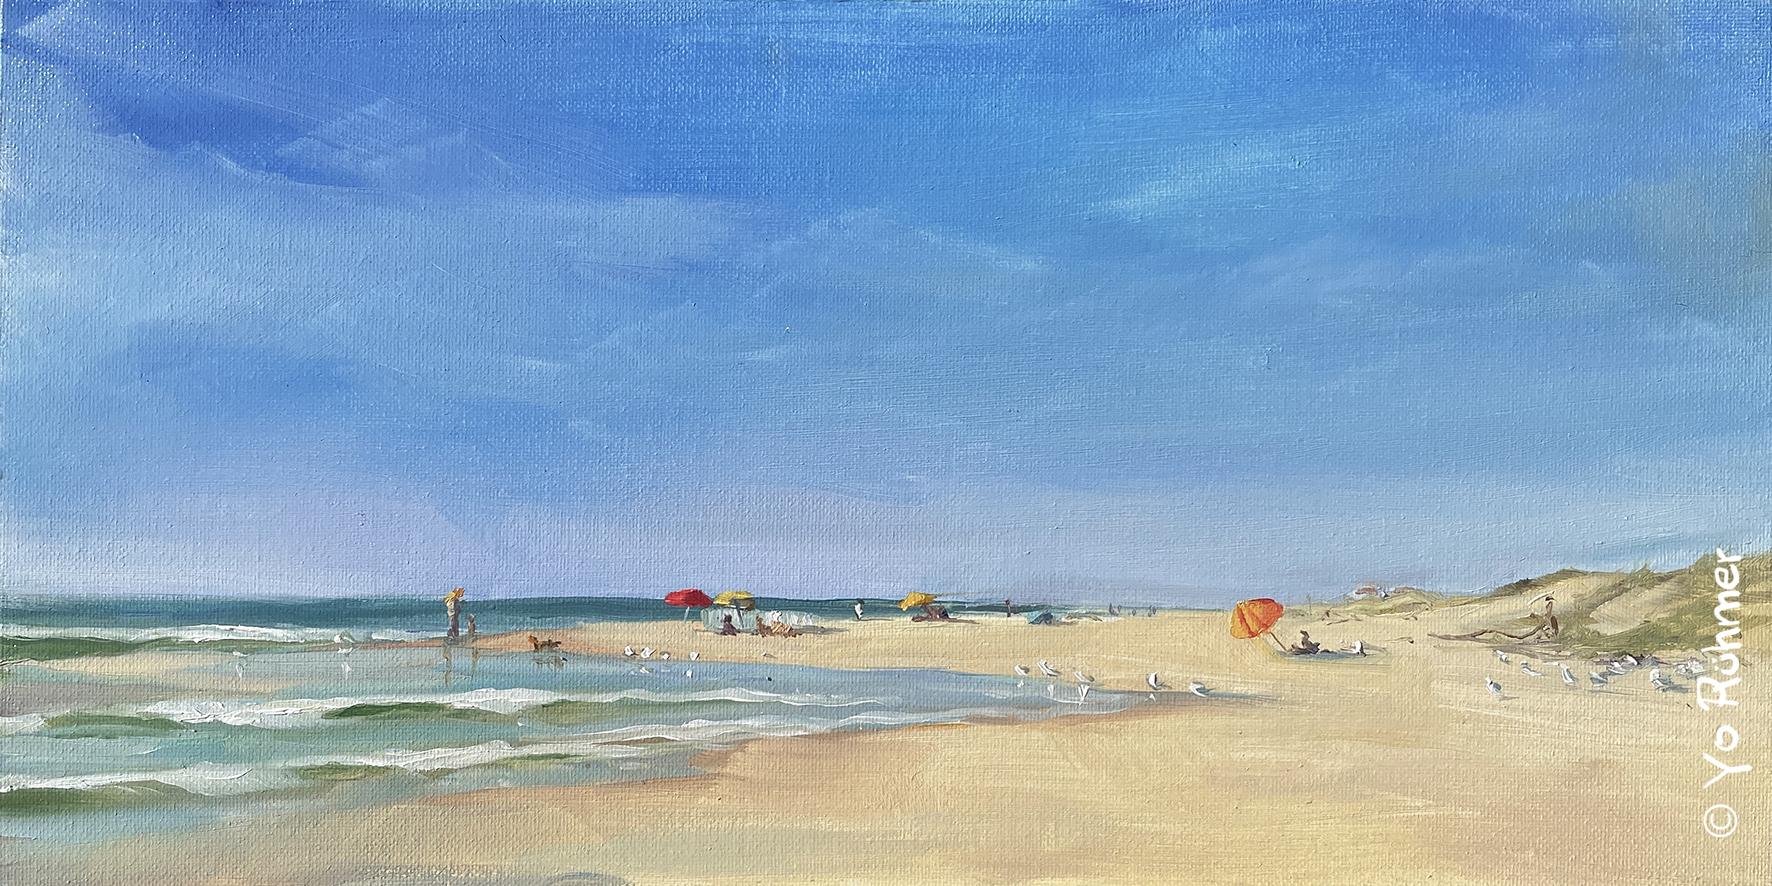 Strand-Contisplage-pleinairmalerei-914